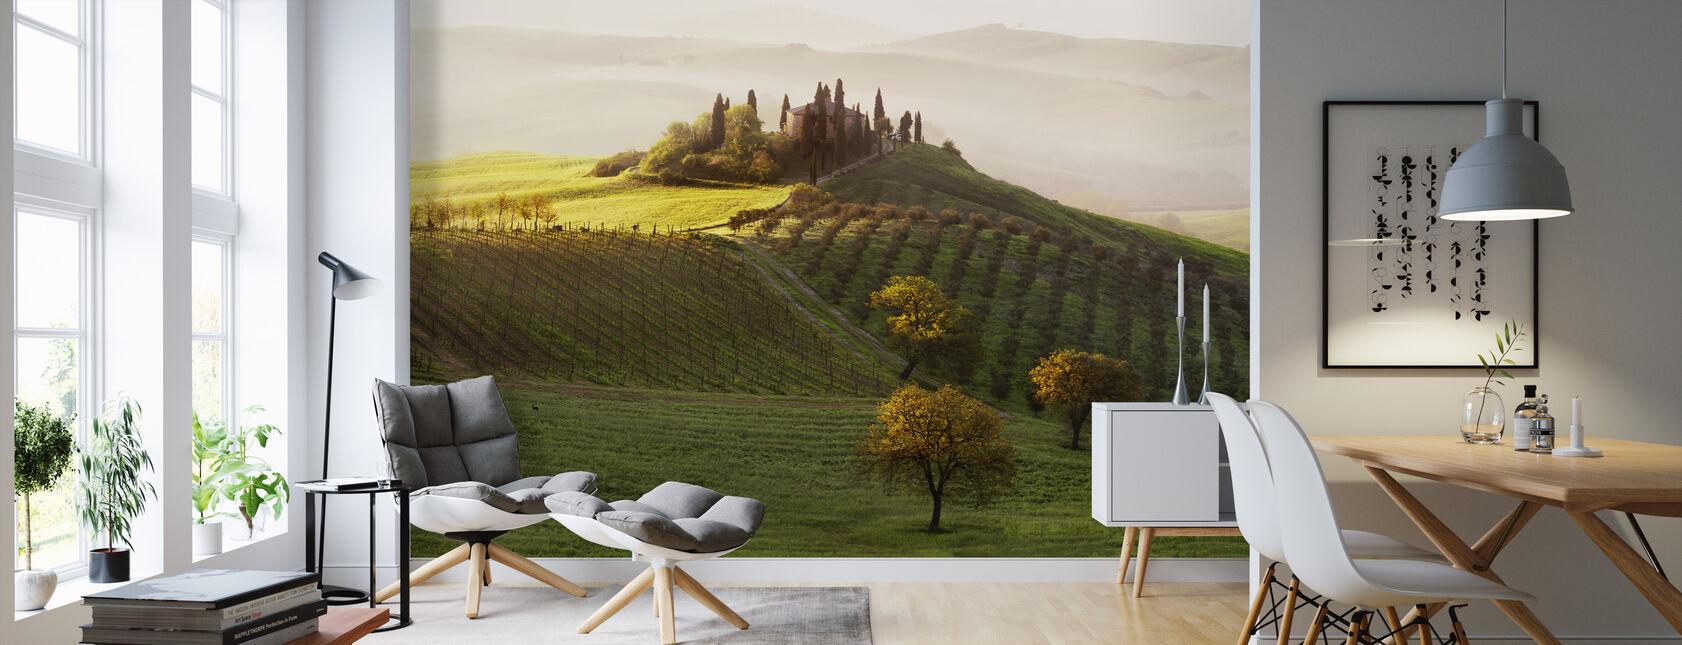 Green Landscape - Wallpaper - Living Room